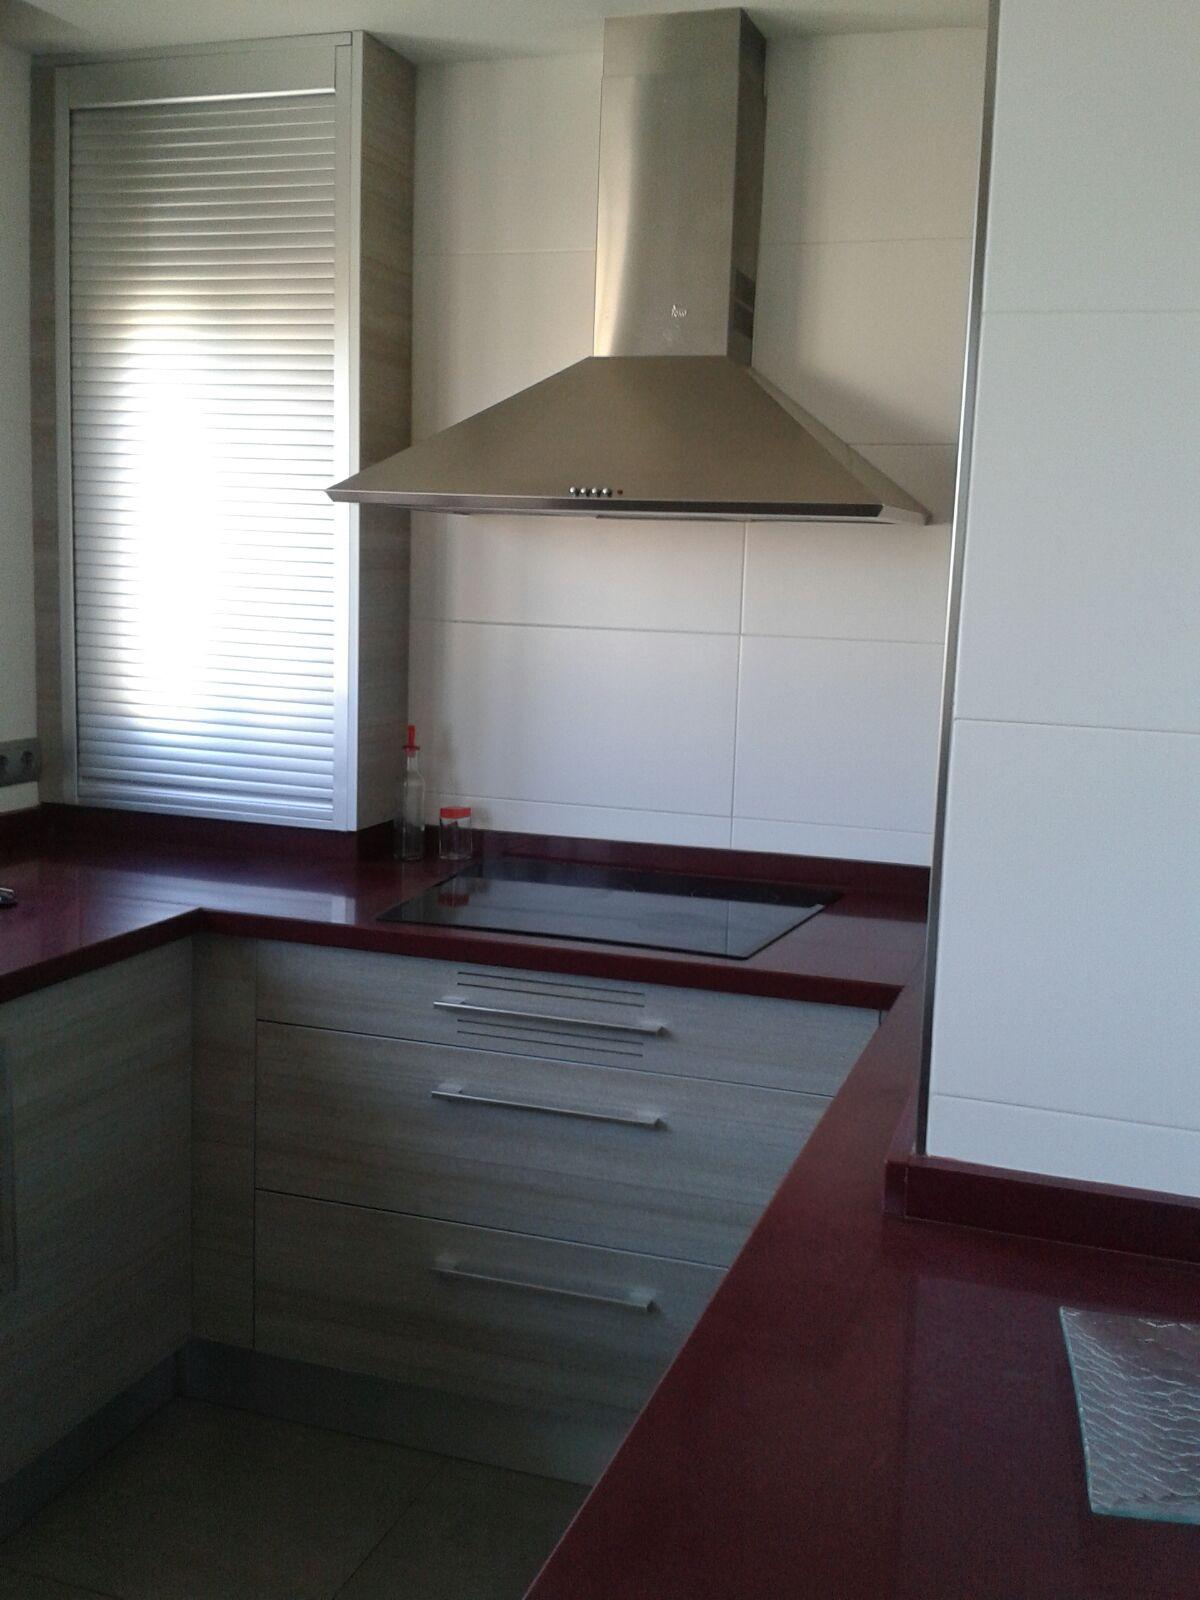 Venta de piso en villarreal vila real piscinas for Piscina villarreal